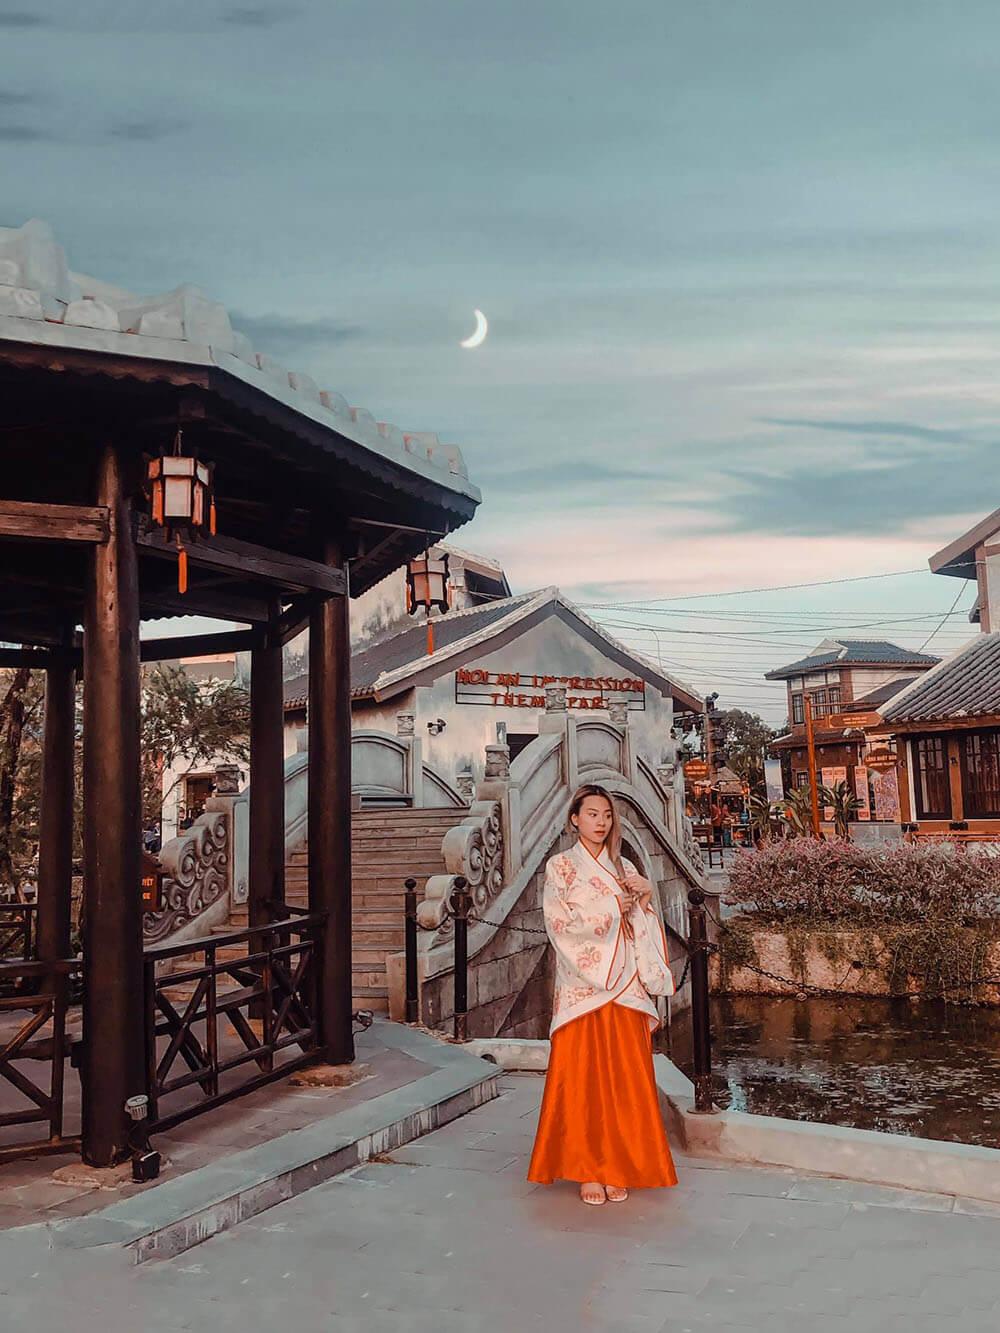 Cong Vien An Tuong Hoi An Show Dien Ky Uc Hoi An Review Kinh Nghiem Kham Pha Hoi An Chi Trong 1 Ngay Danang Fantasticity Com 010